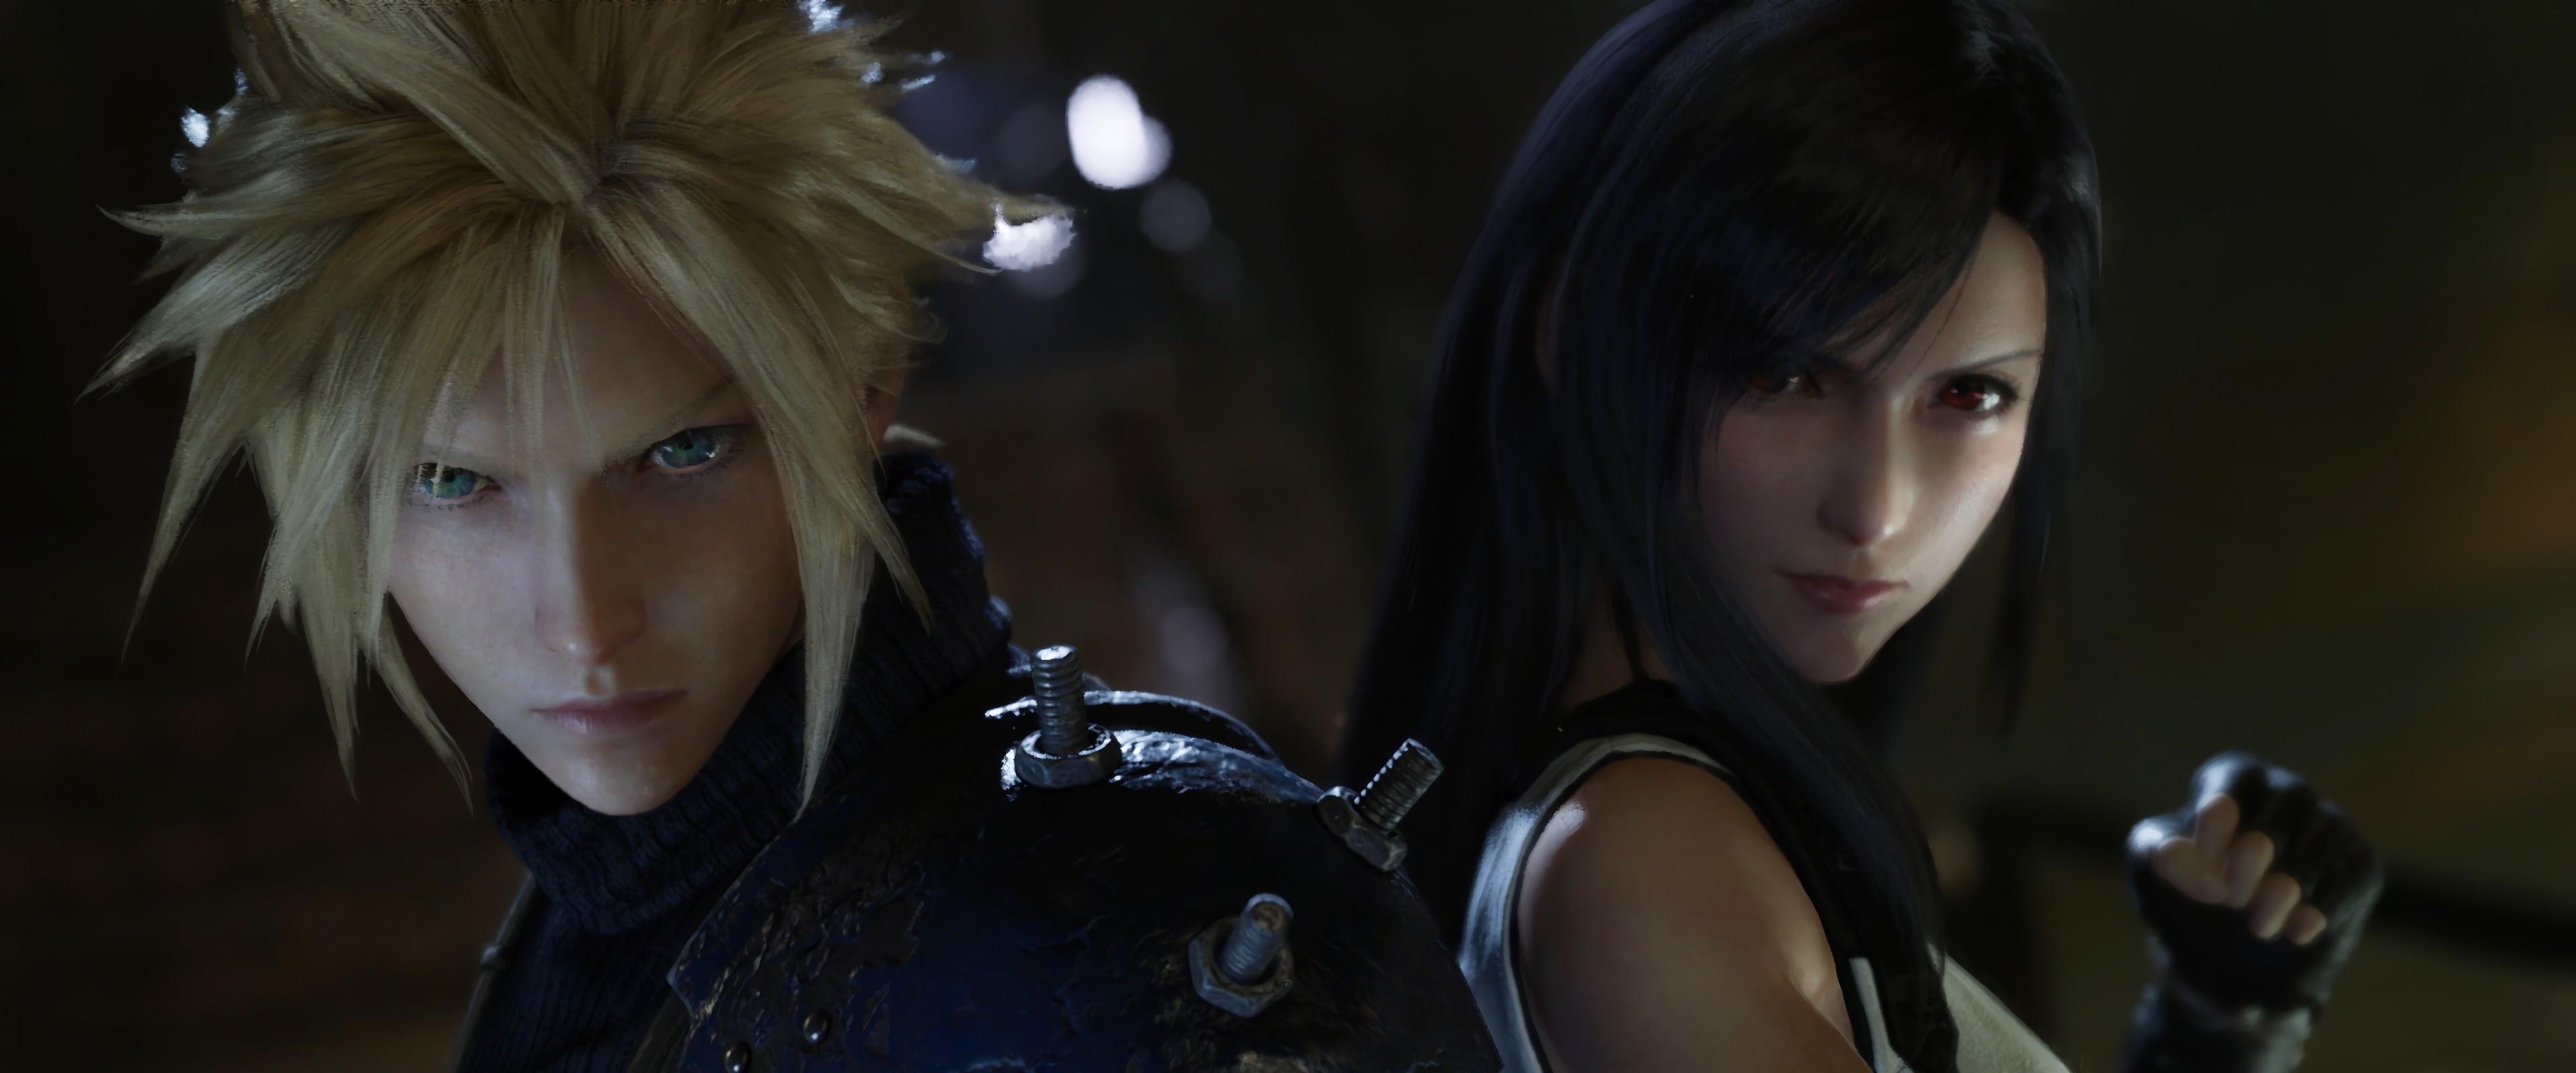 Final Fantasy 7 Remake Cloud Strife Tifa Lockhart 4k Wallpaper 15